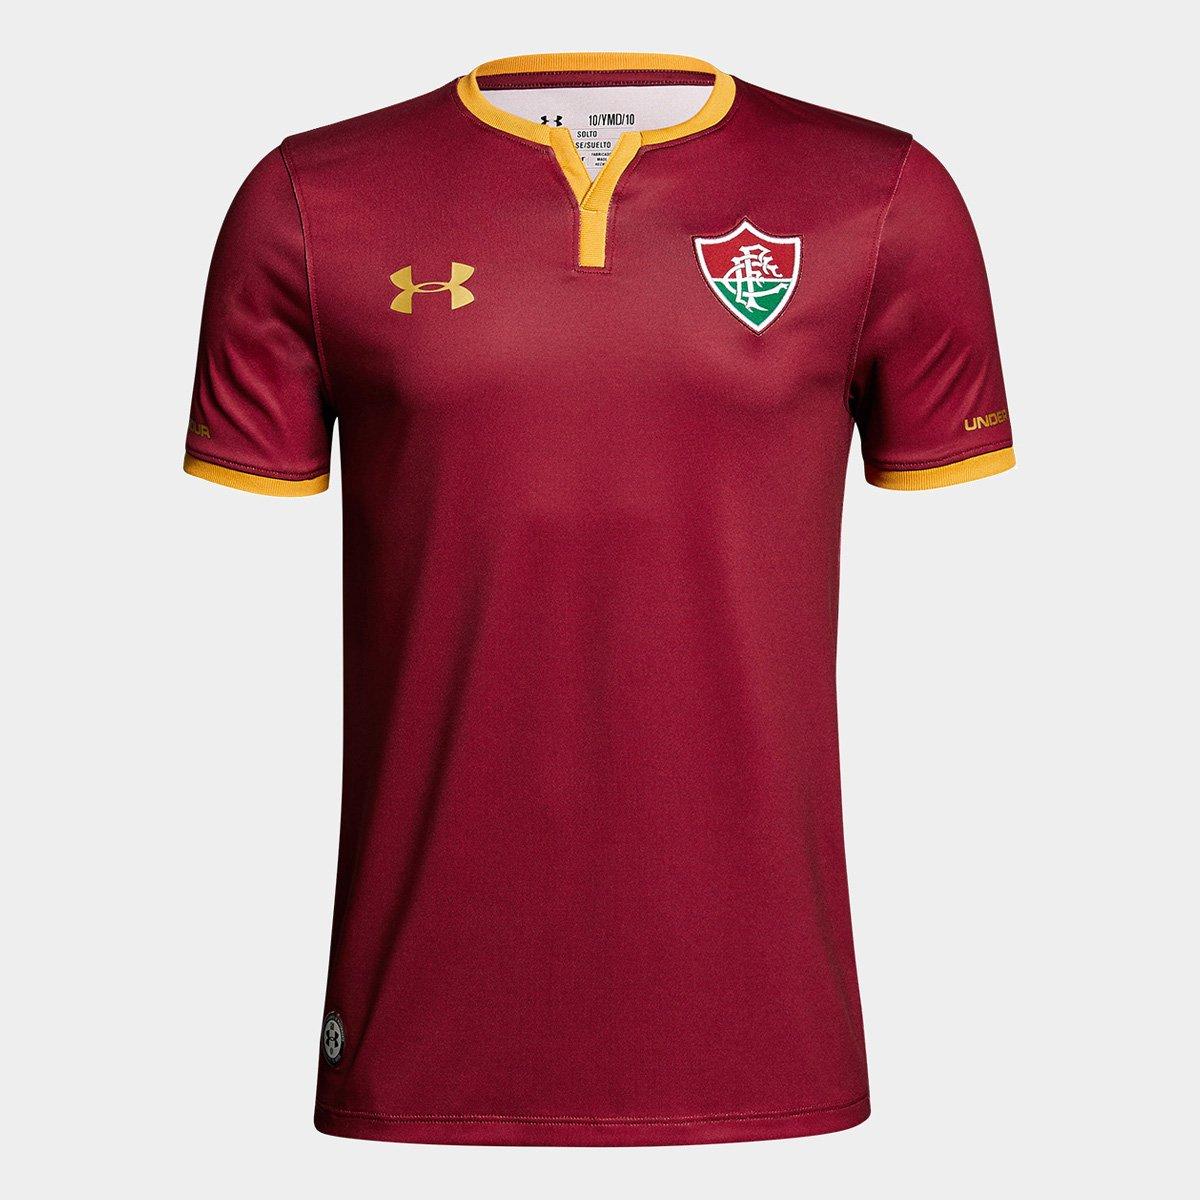 2111e8c25d9 Camisa Fluminense III 17 18 s nº - Torcedor Under Armour Masculina